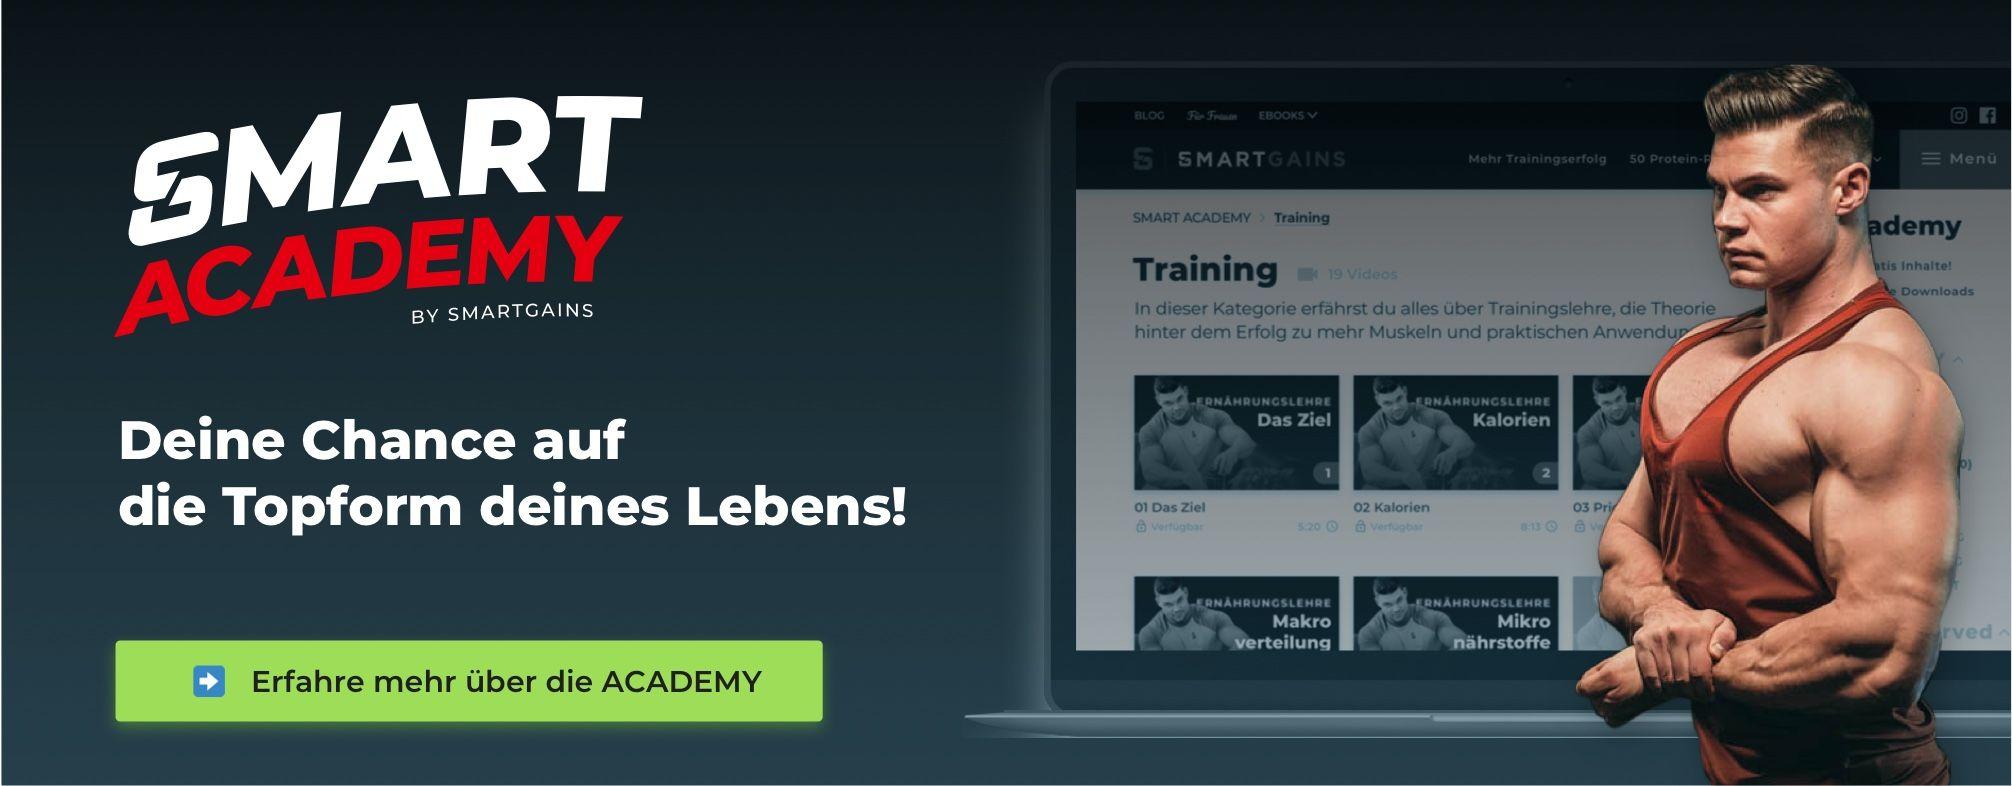 slider-smart-academy